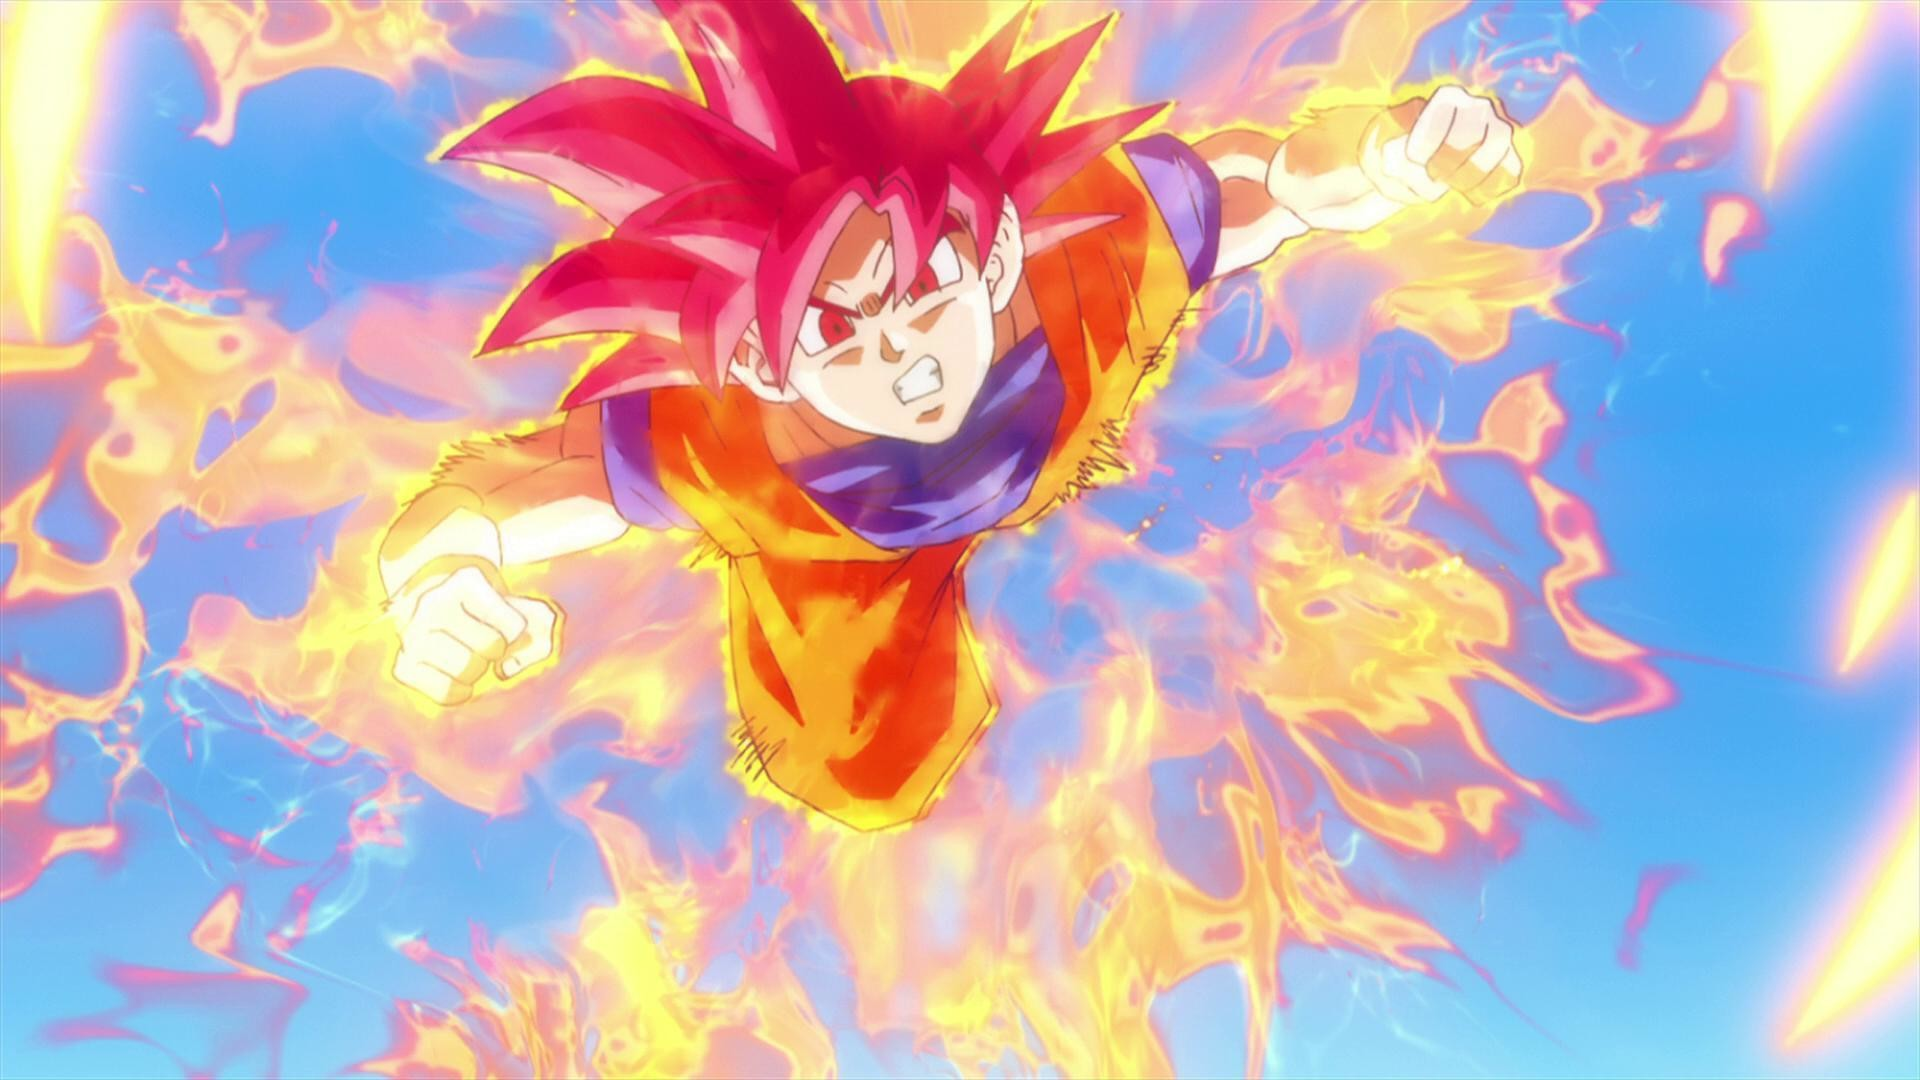 Dragon Ball Z Wallpaper Goku Super Saiyan God Wallpapers Photo .